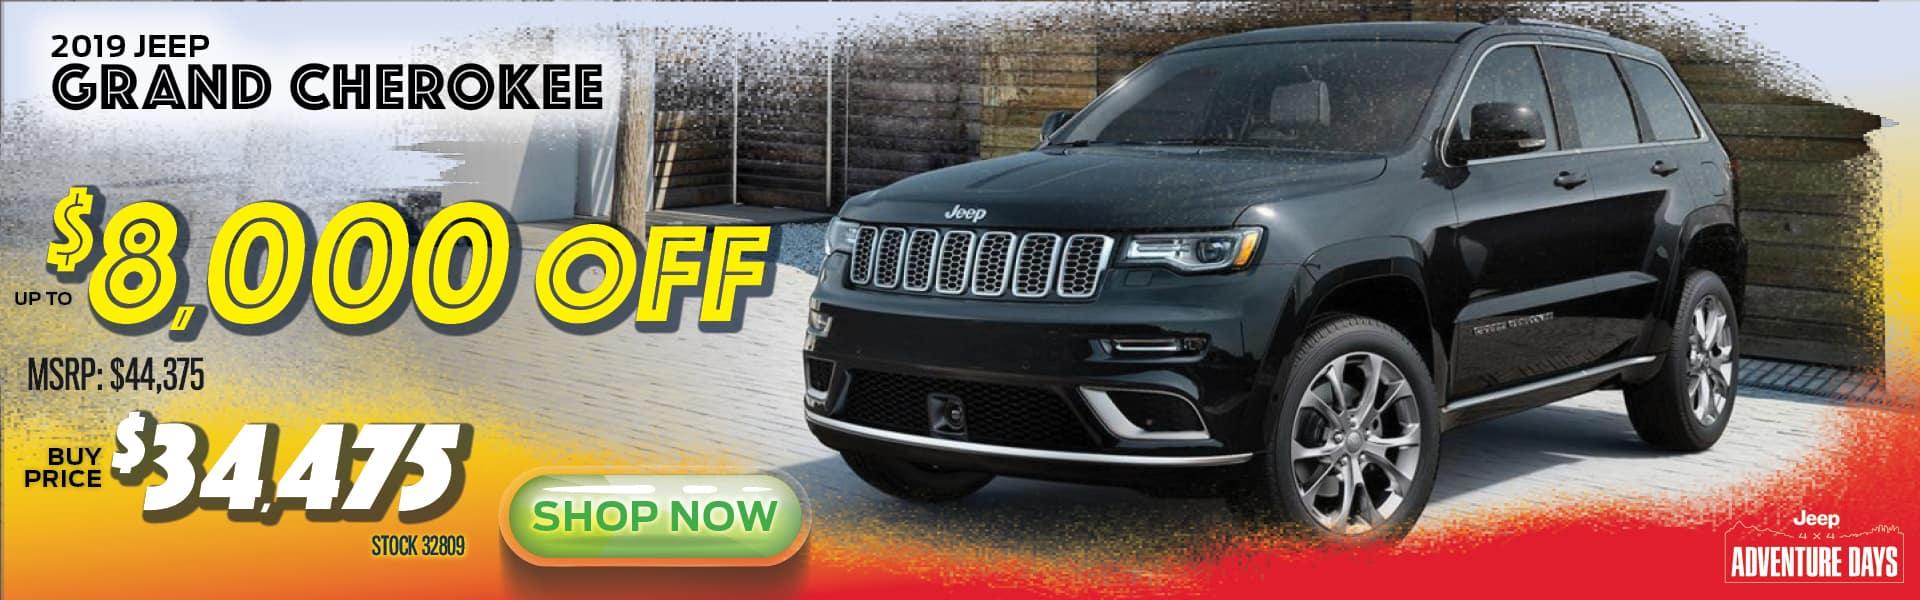 2019 Jeep Cherokee For Sale in Atlanta, Georgia